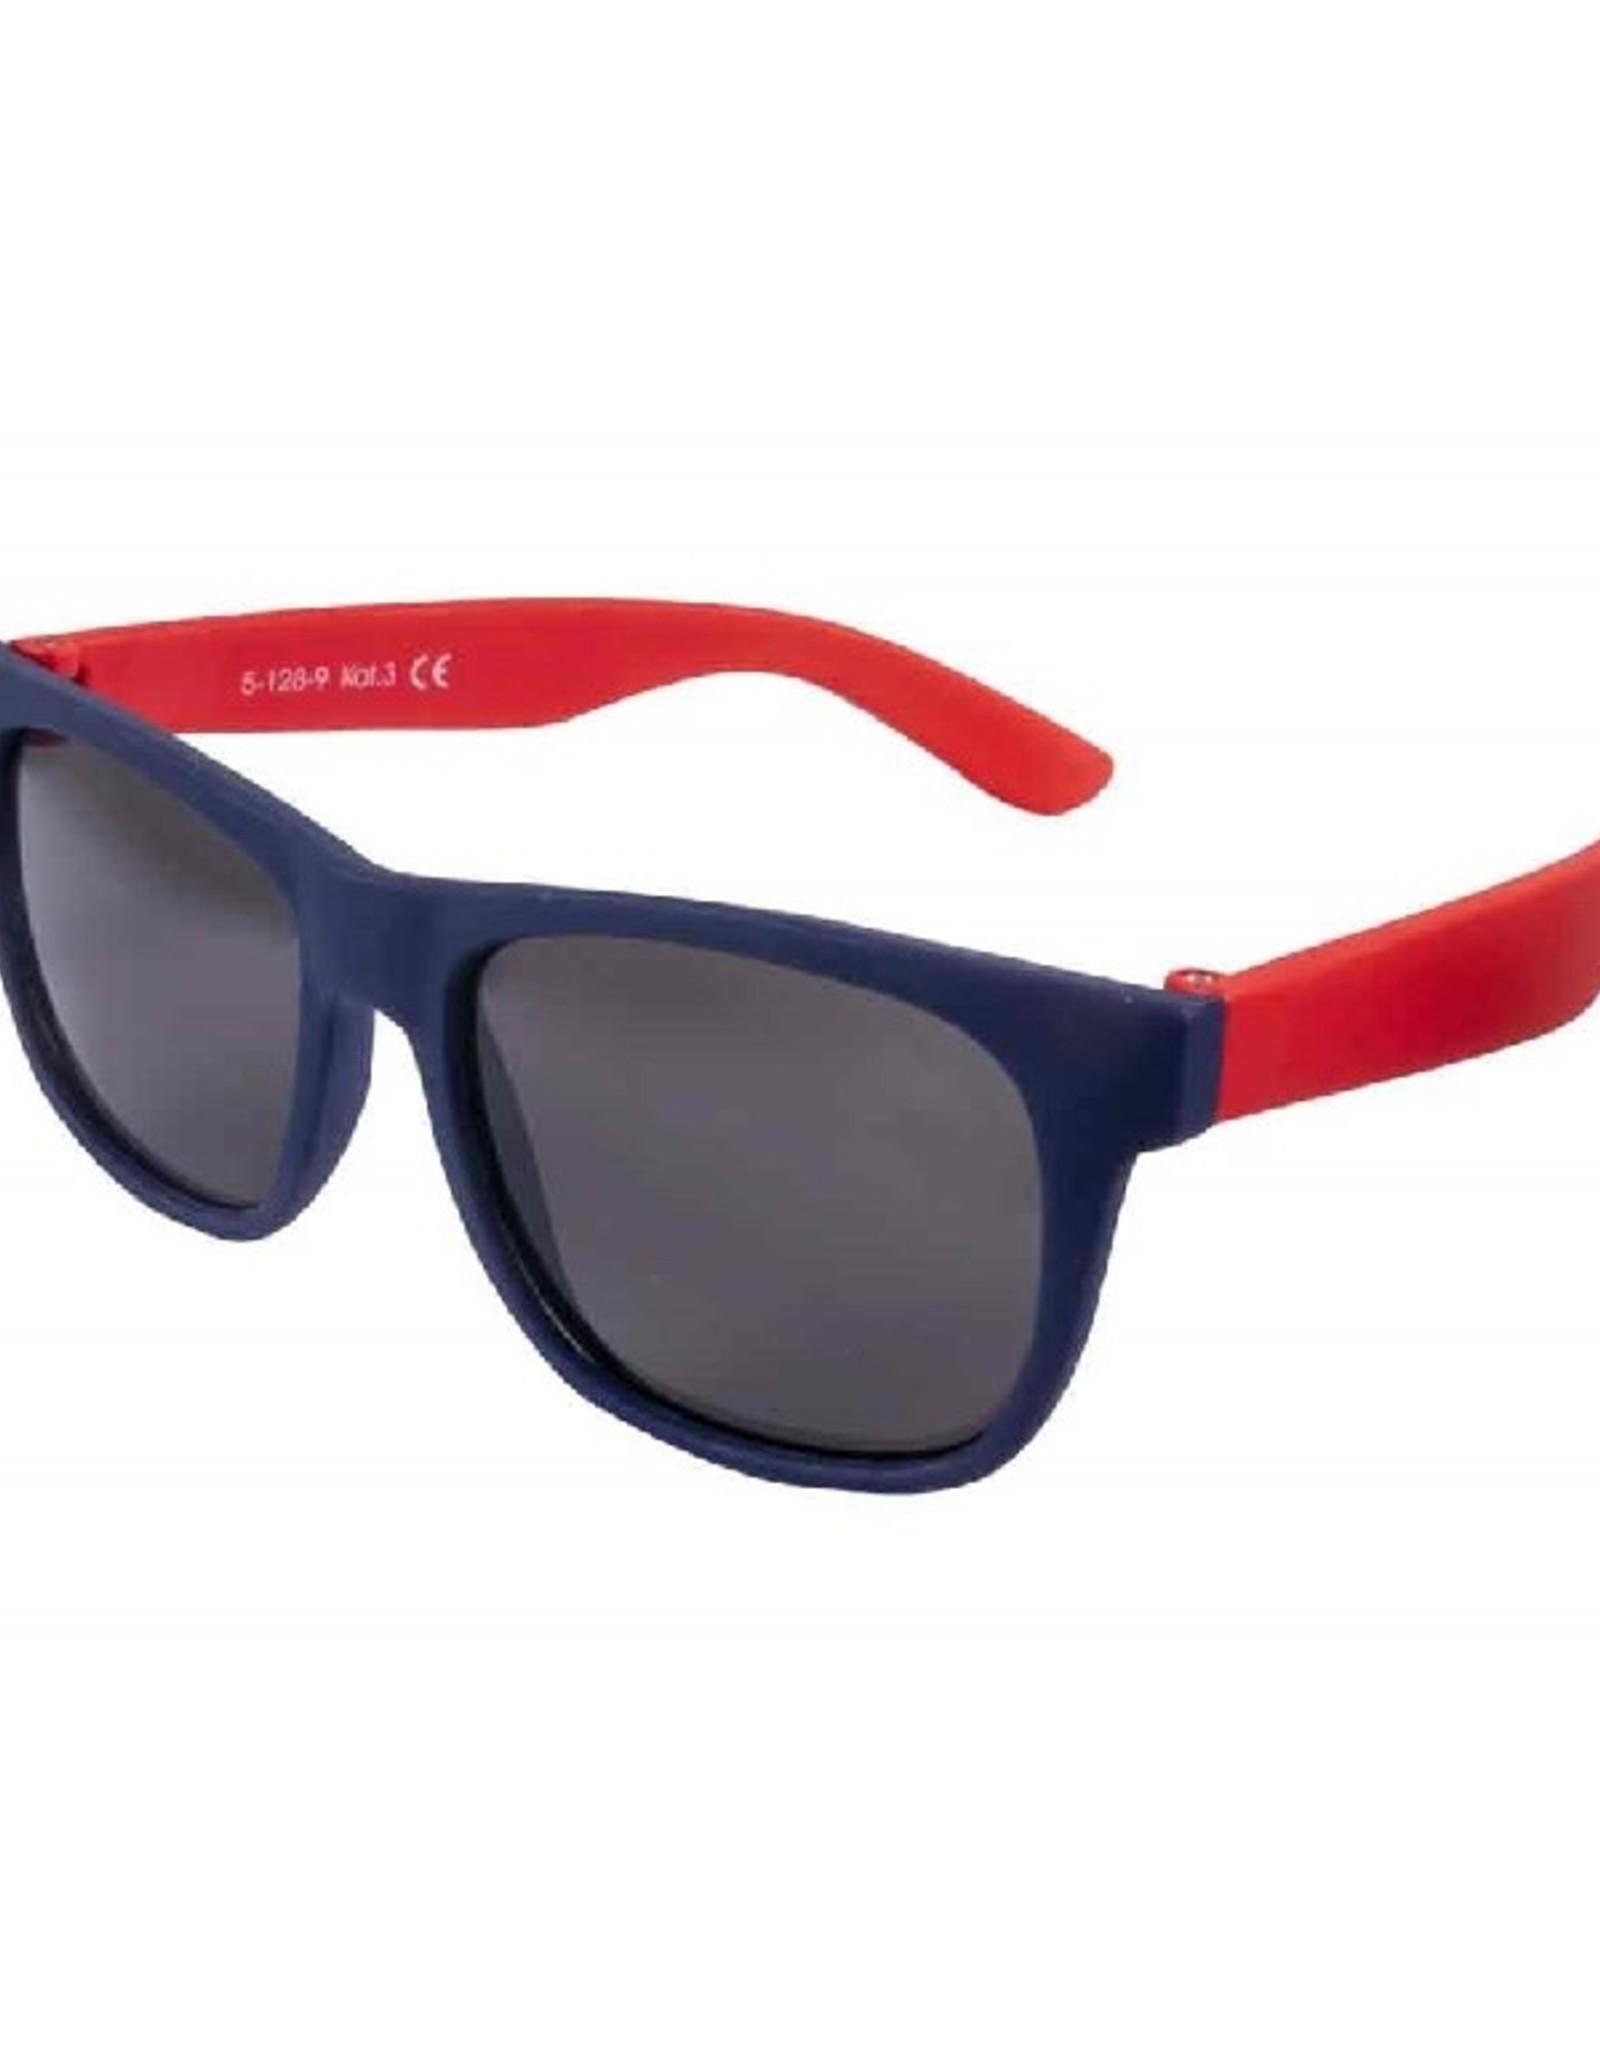 Zonnebril Flex RB navy/rood